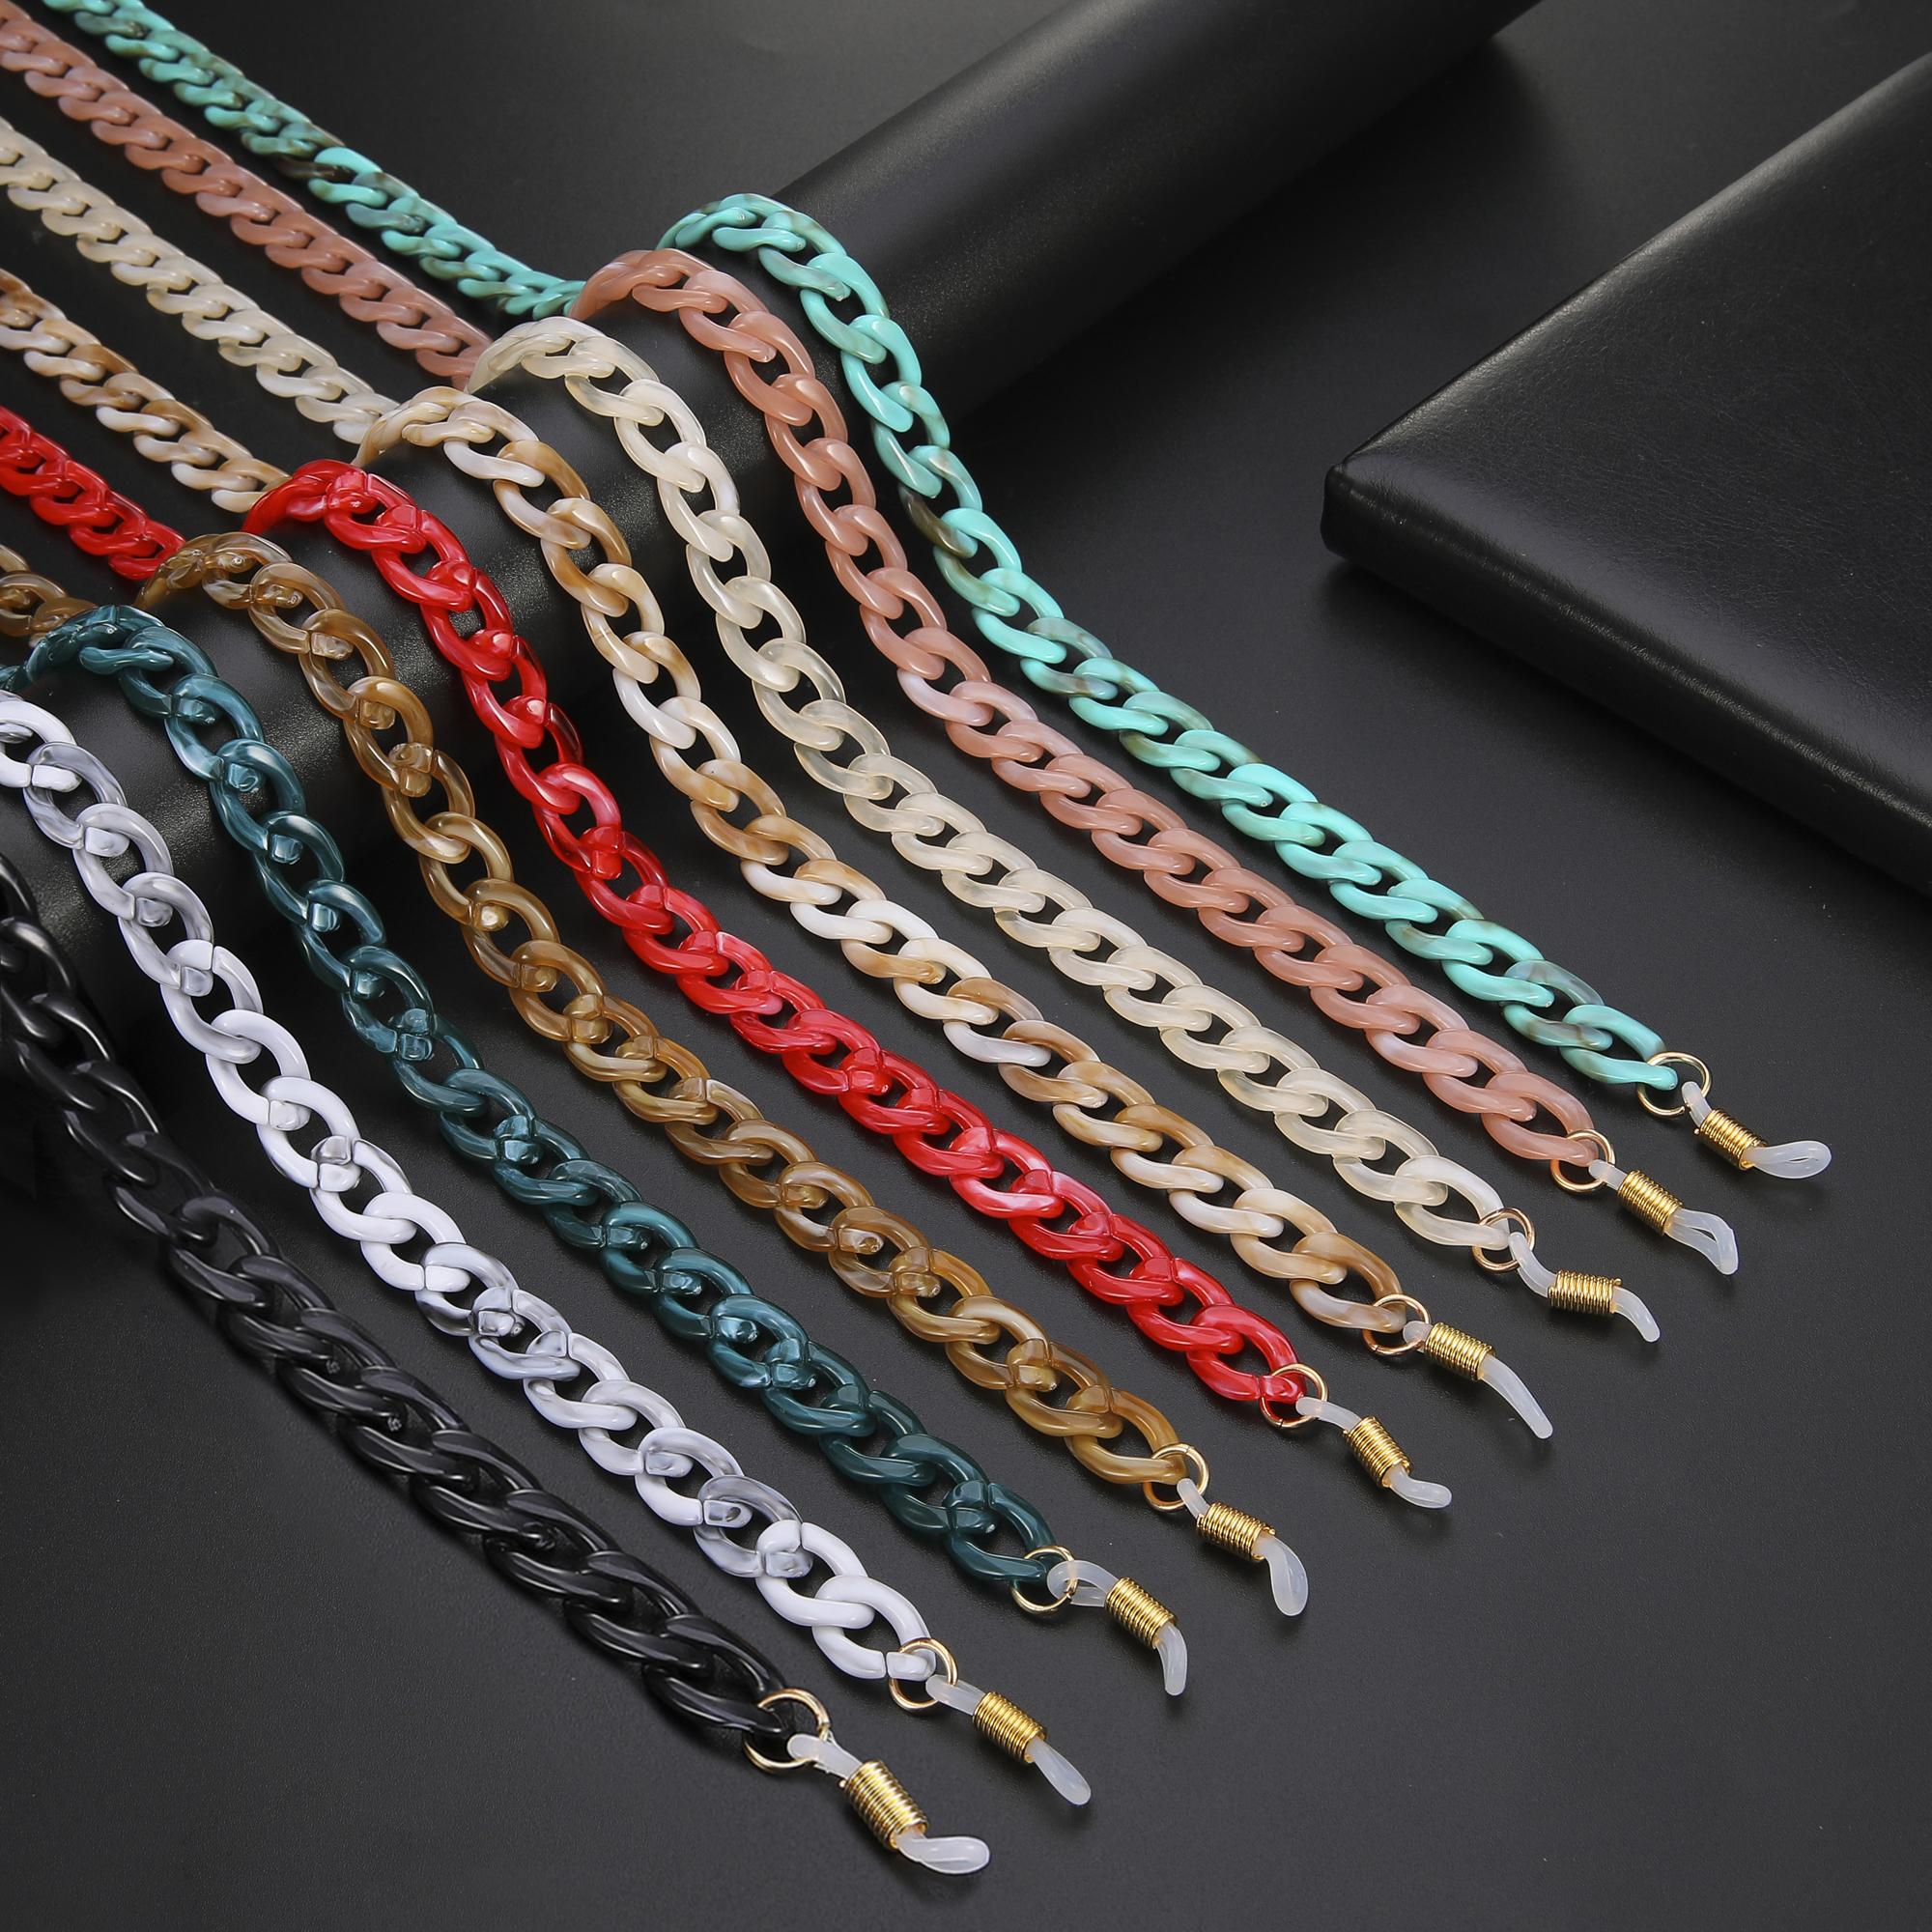 Skyrim Fashion Acrylic Sunglasses Chains Lanyard Women Anti slip Reading Glasses Chain Cord Holder Neck Strap Rope Gift 2021